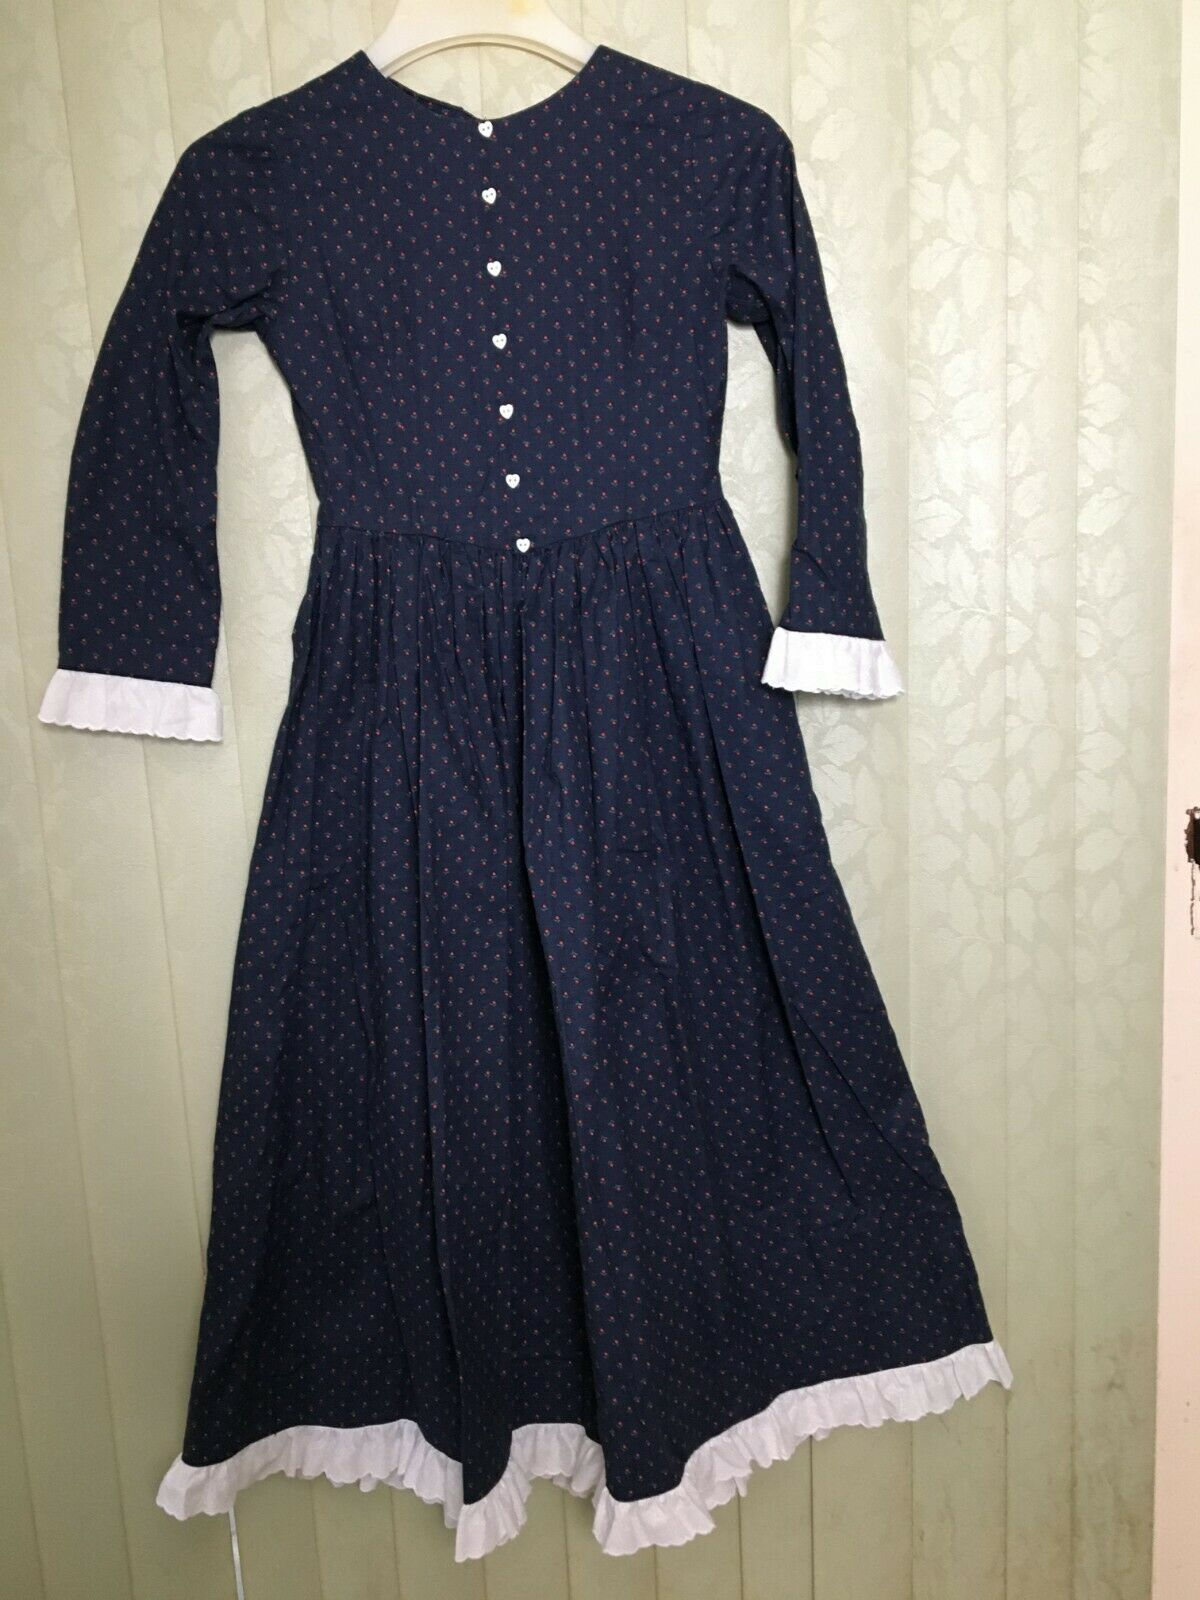 Handmade Prairie Dress Blau with Ruffle Cuffs and Hem Größe Small